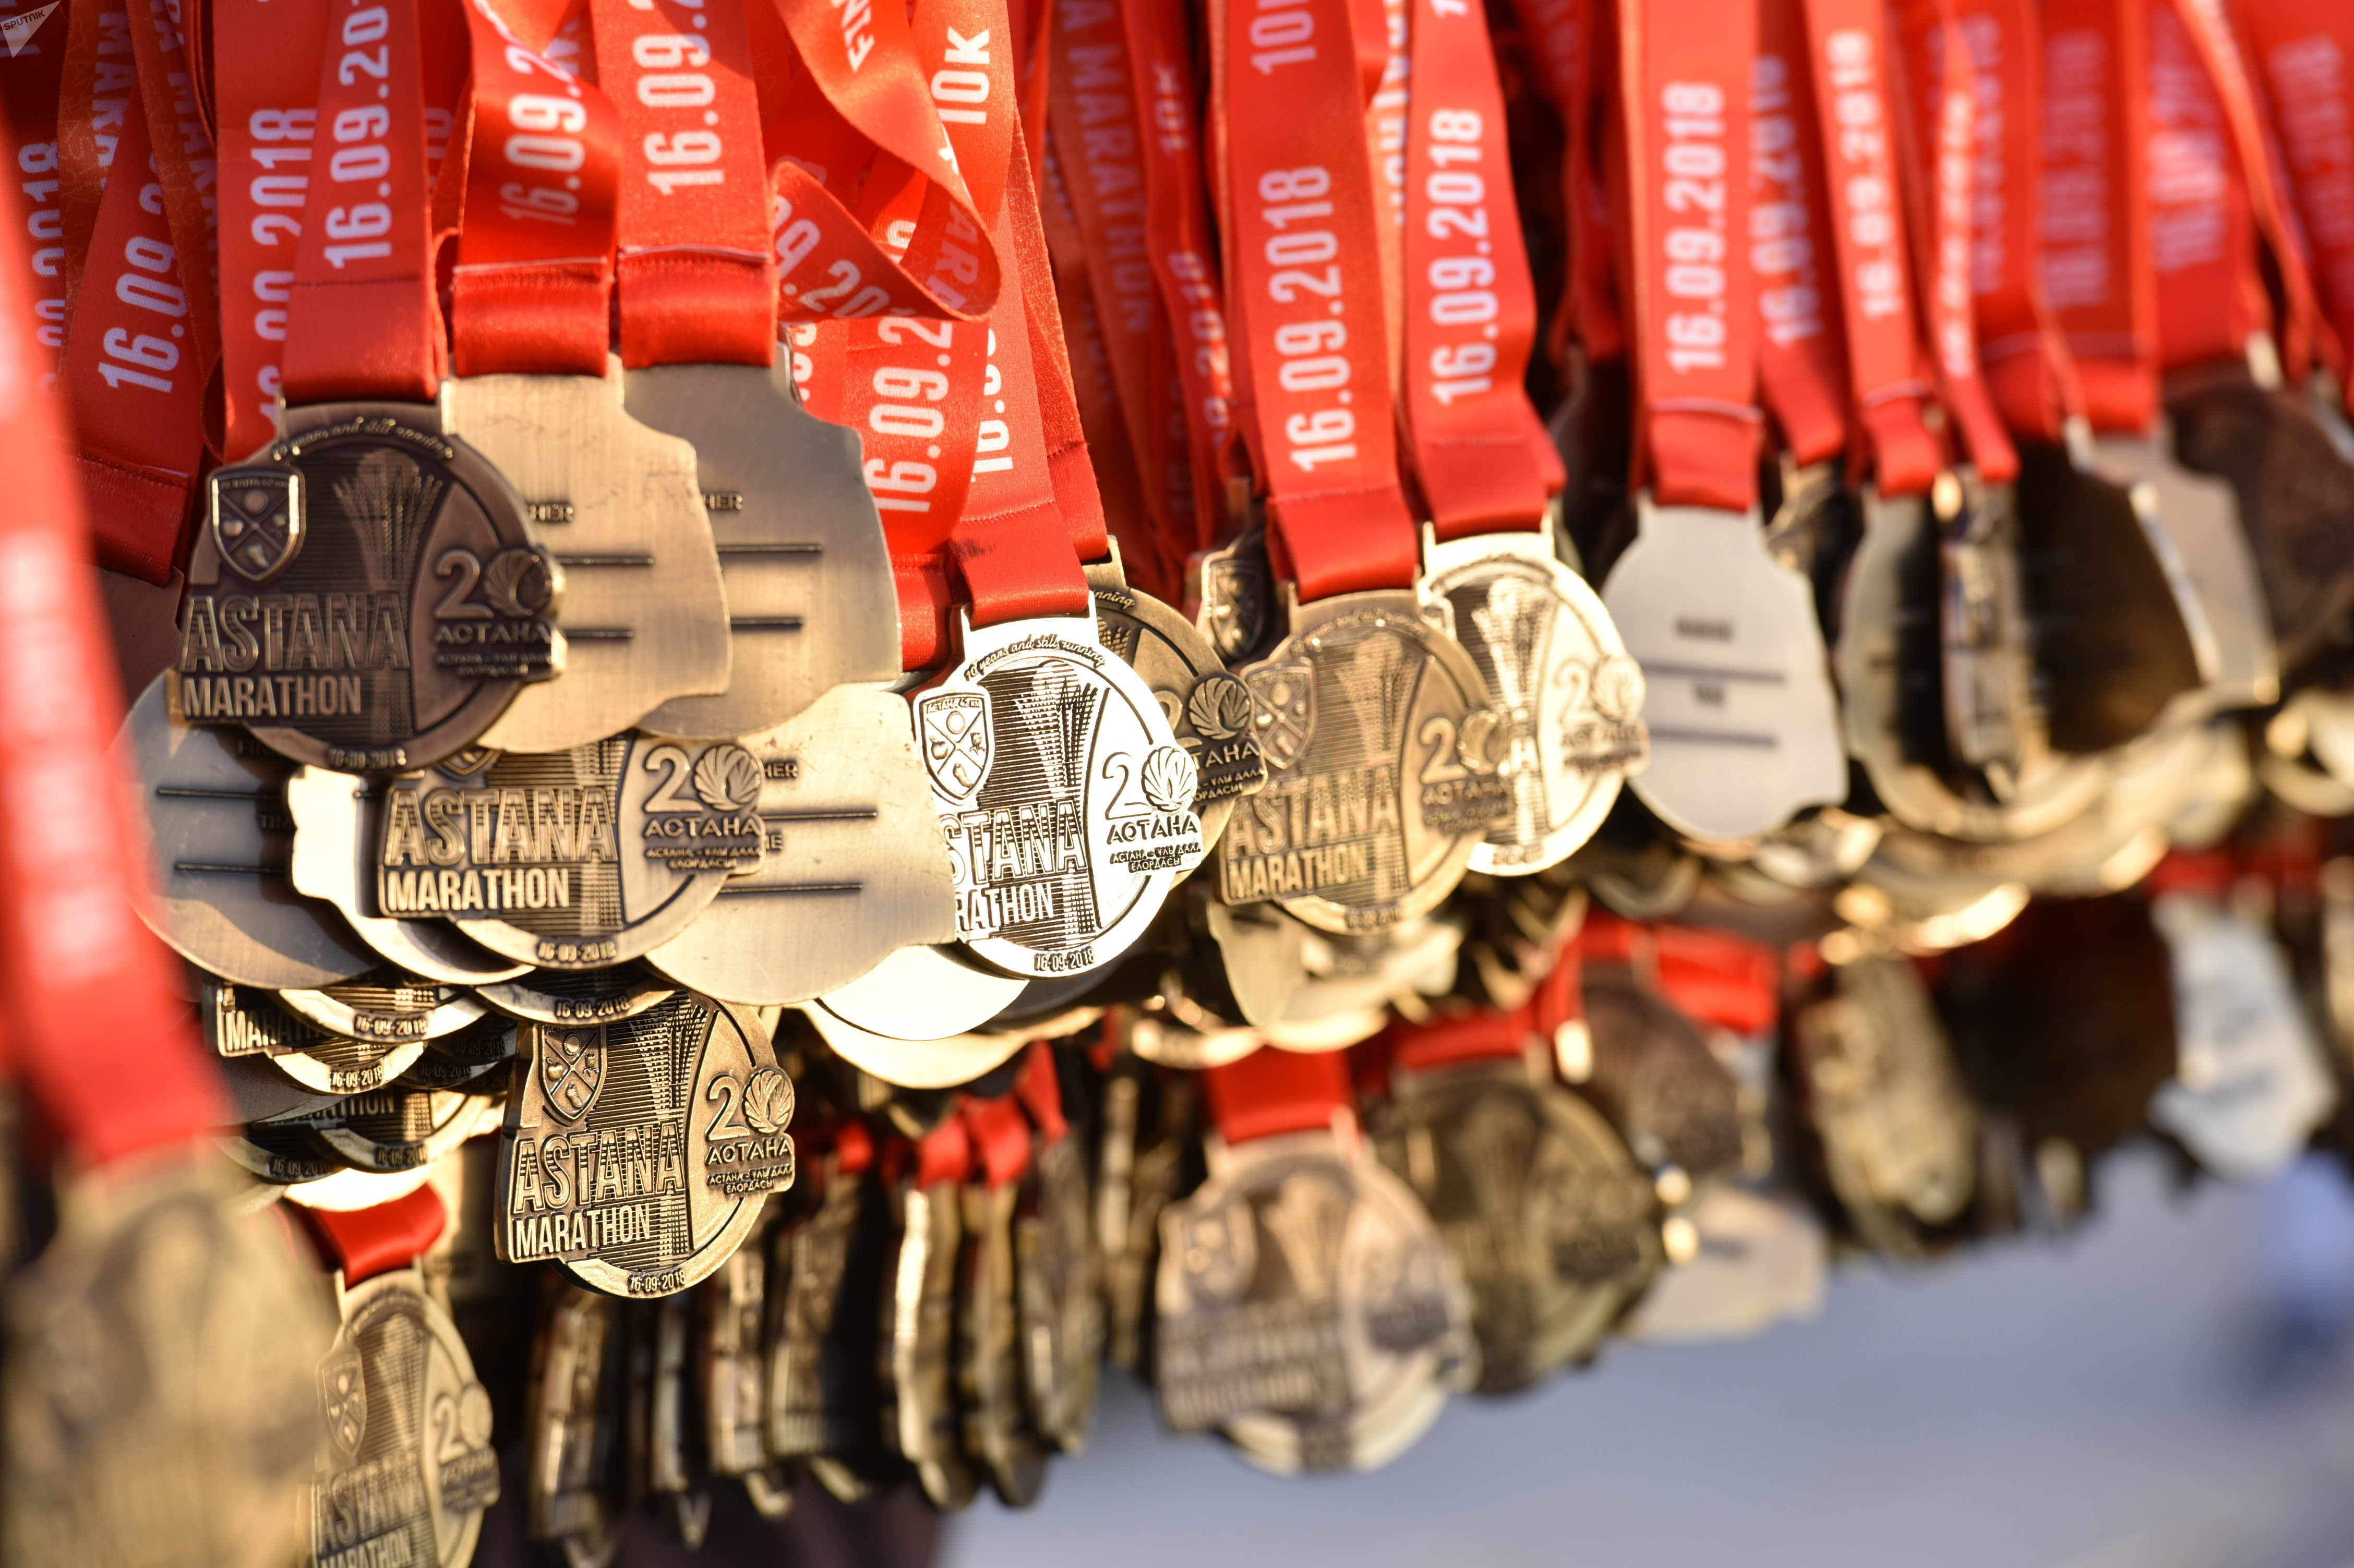 Медали для участников Астана марафон